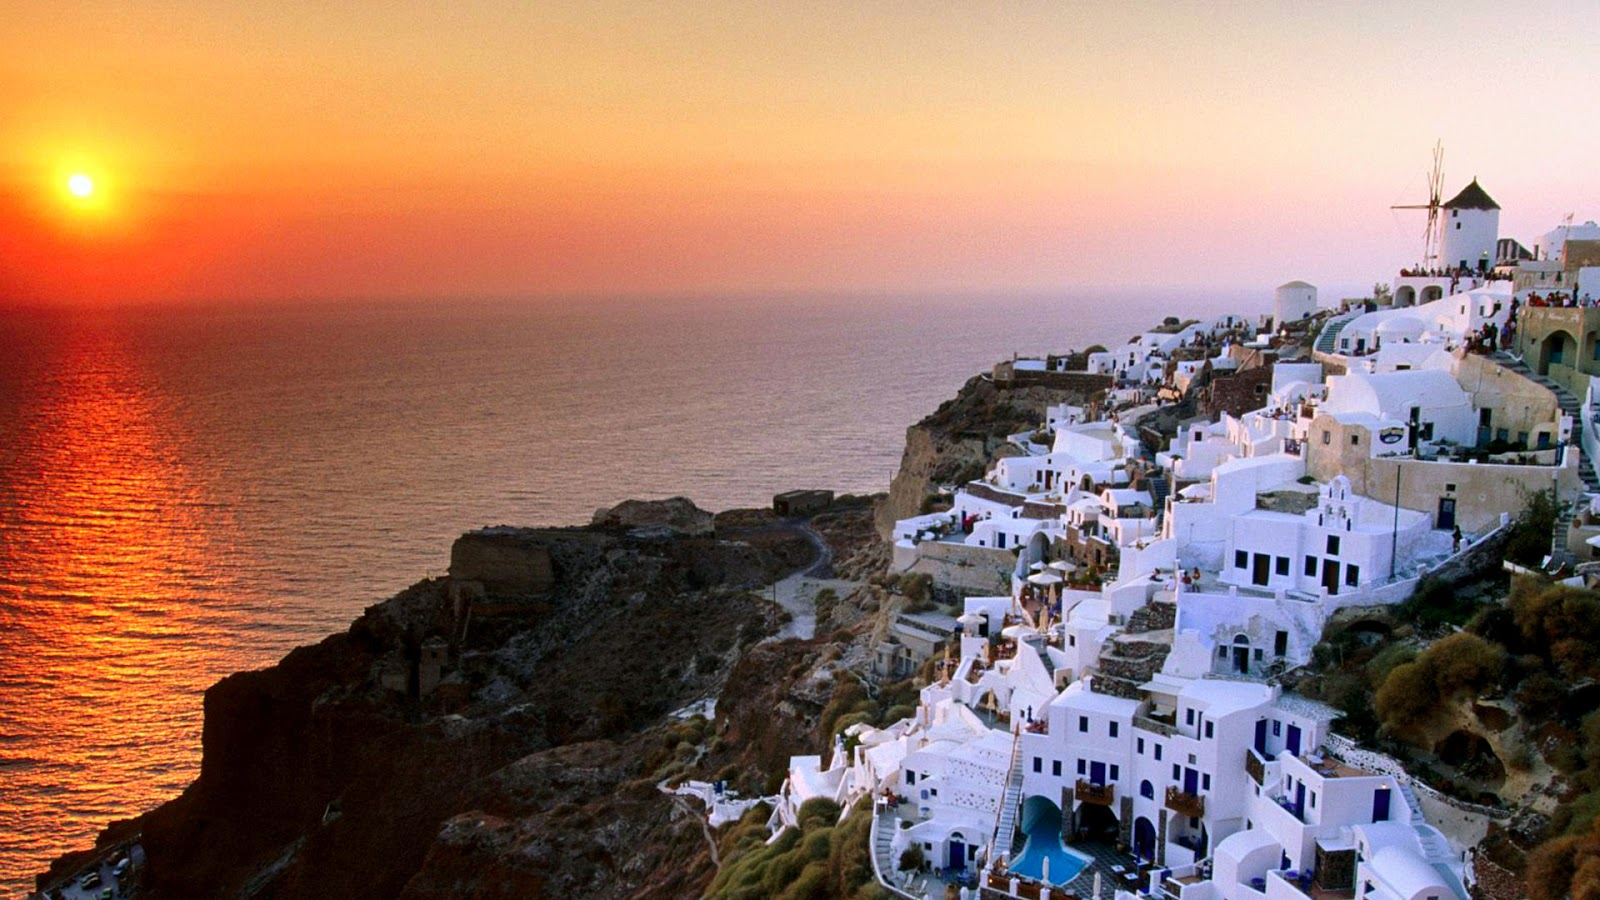 Destination Greece Health First: Η νέα καμπάνια της Ελλάδας για τον τουρισμό